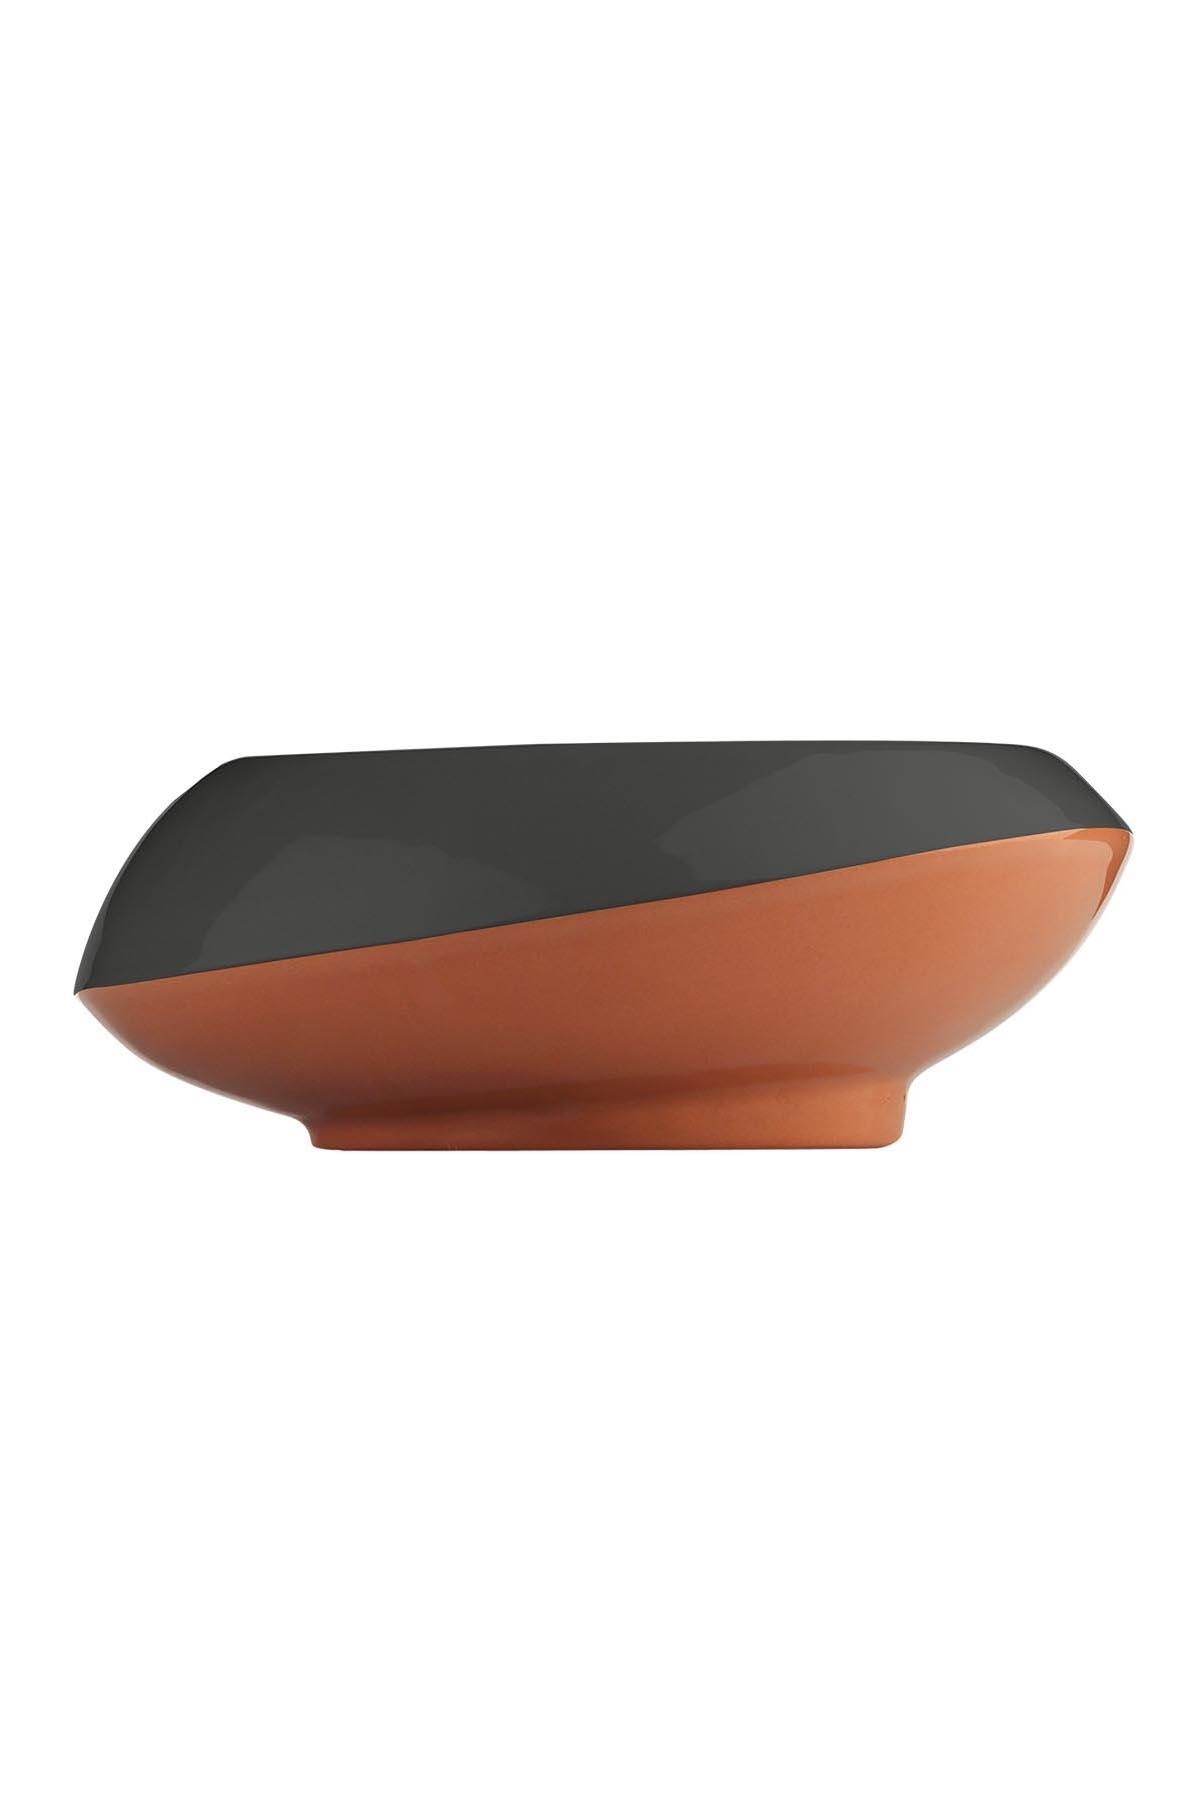 Kütahya Porselen - Aura 23 cm Kase 3 Renkli Kırmızı/Siyah/Yeşil